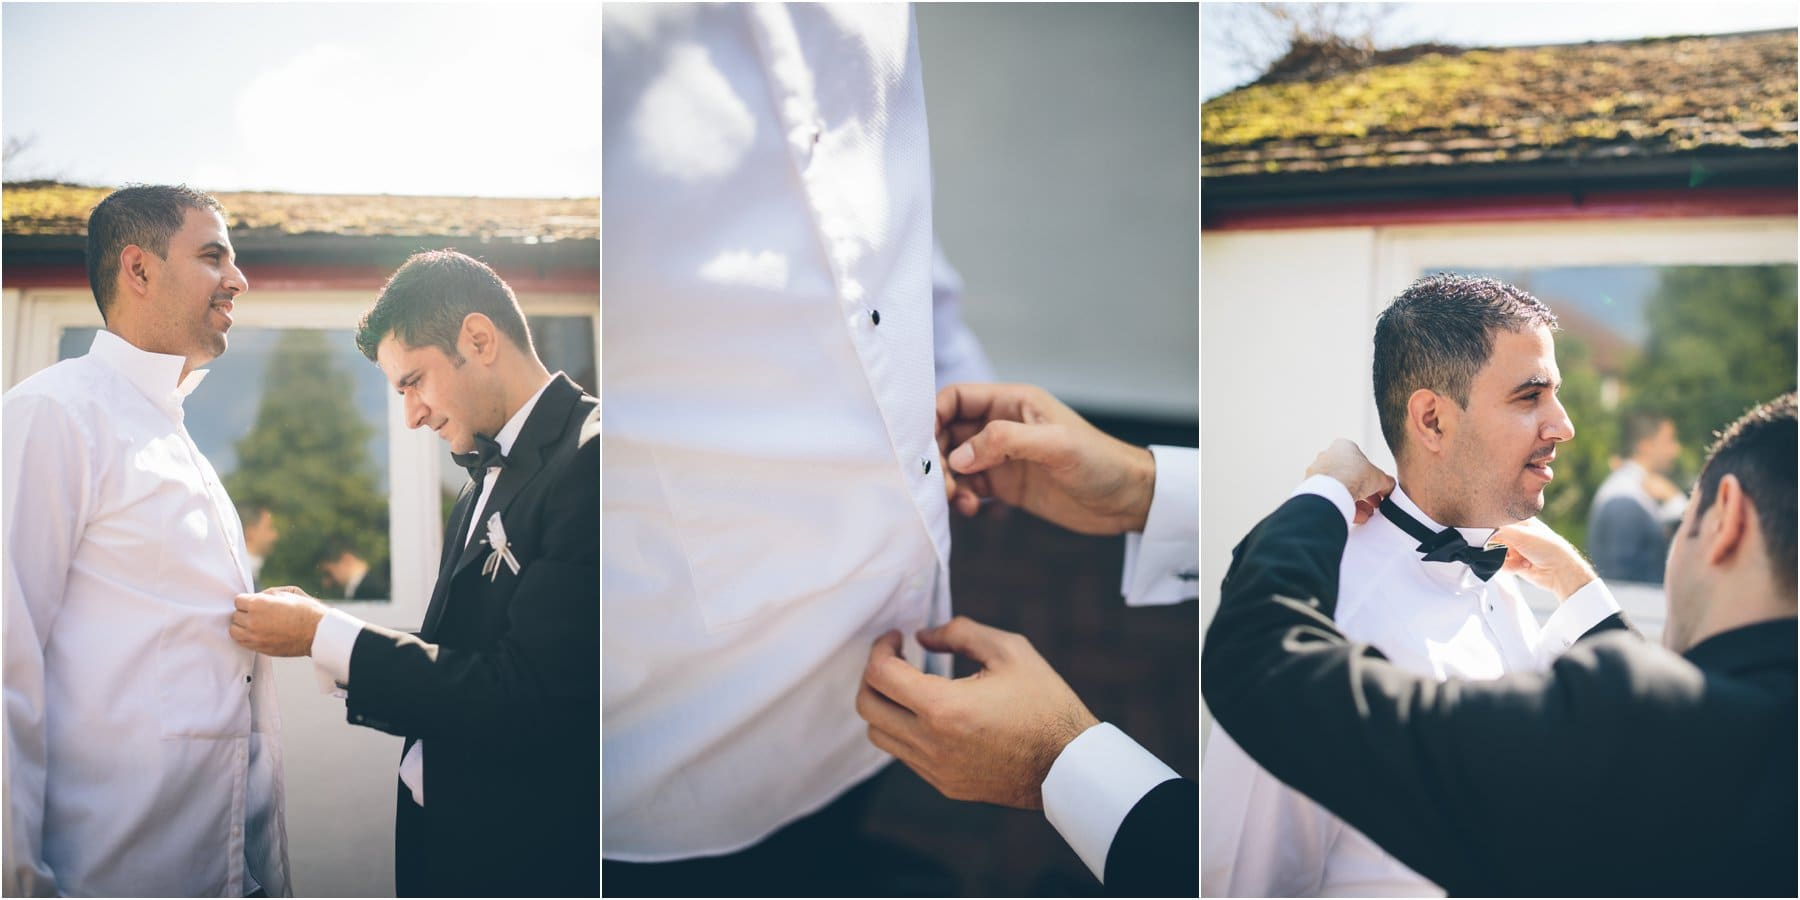 Midland_Manchester_Wedding_Photography_0006